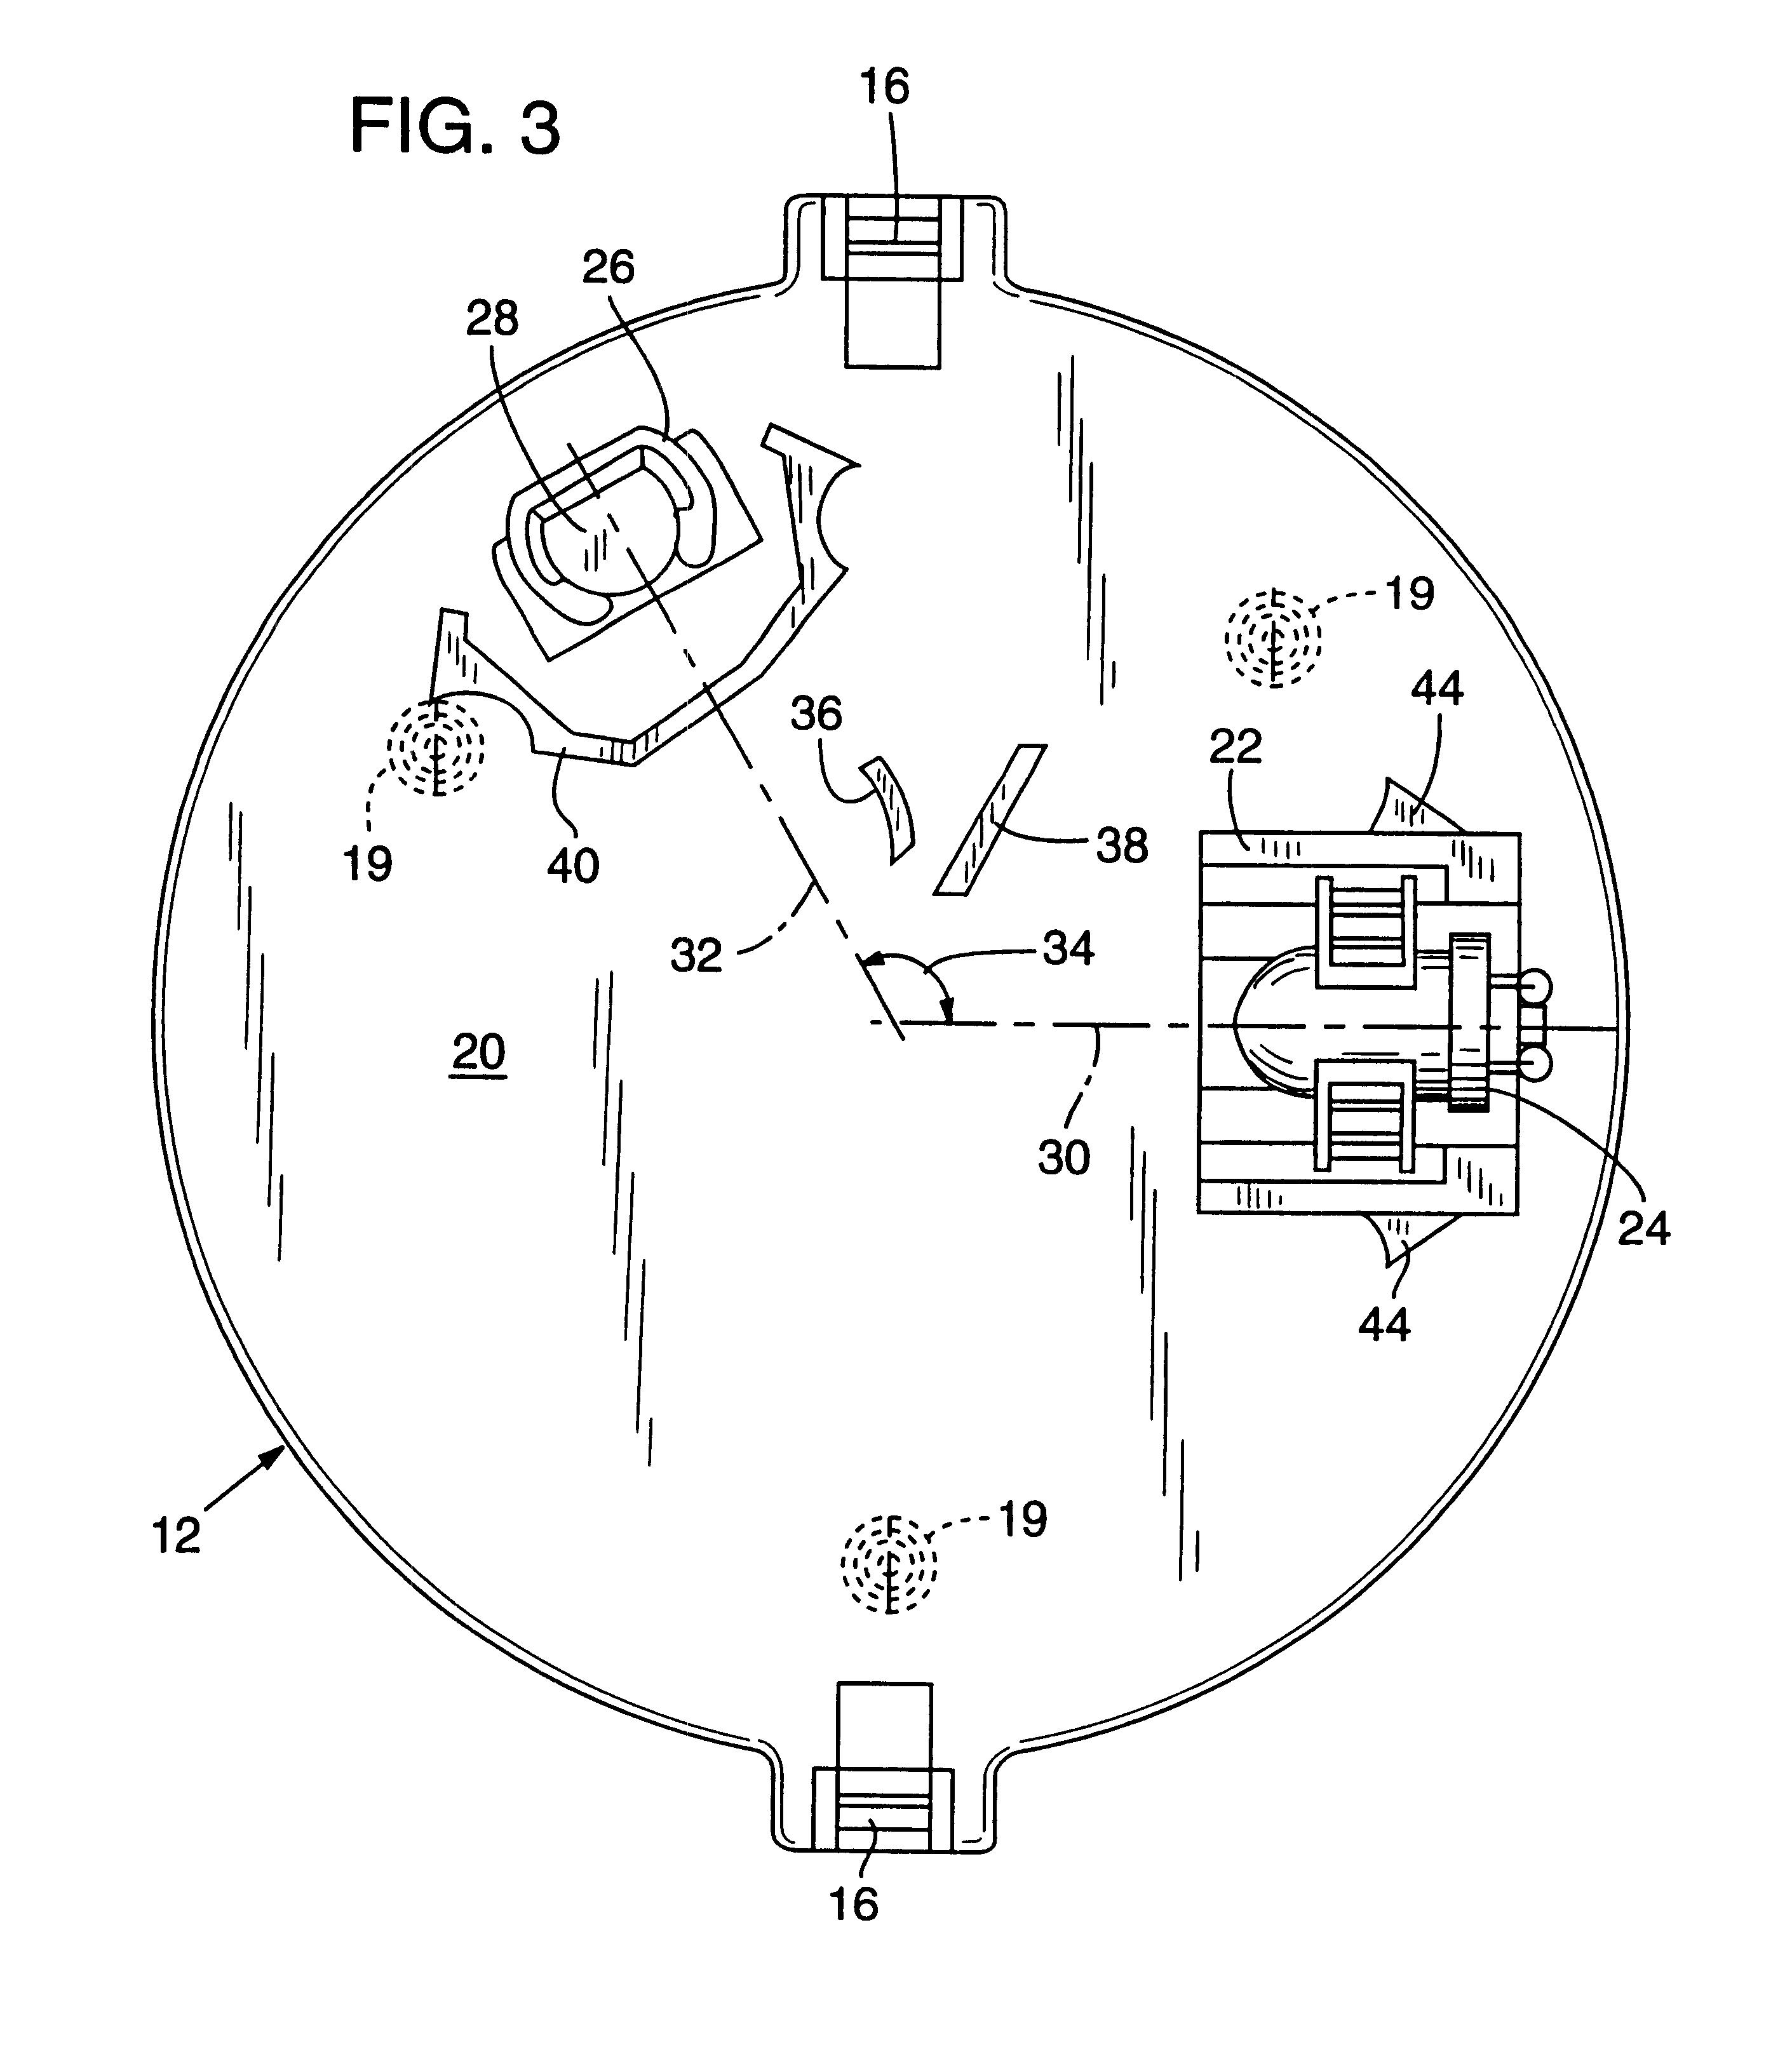 US06396405 20020528 D00003 apollo smoke detector wiring diagram wiring diagram collection,Fire Alarm Circuit Wiring